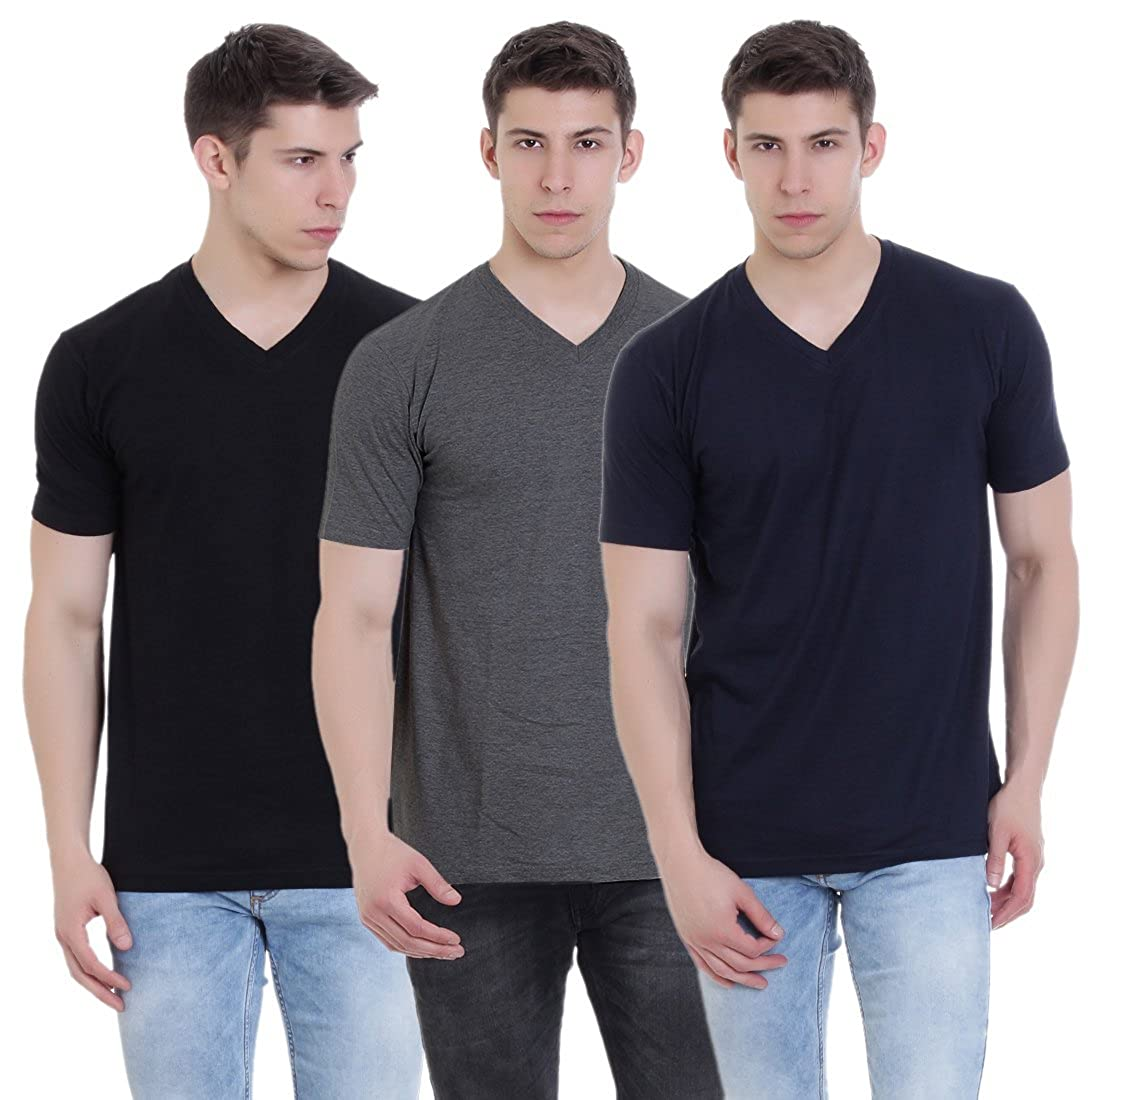 06bfc9787 FAB69 Solid Men's V Neck Half Sleeve Cotton Plain Black/Navy Blue/Charcoal Melange  T-Shirt (Combo Pack of 3) - Leather Patch - Bottom Hem: Amazon.in: ...